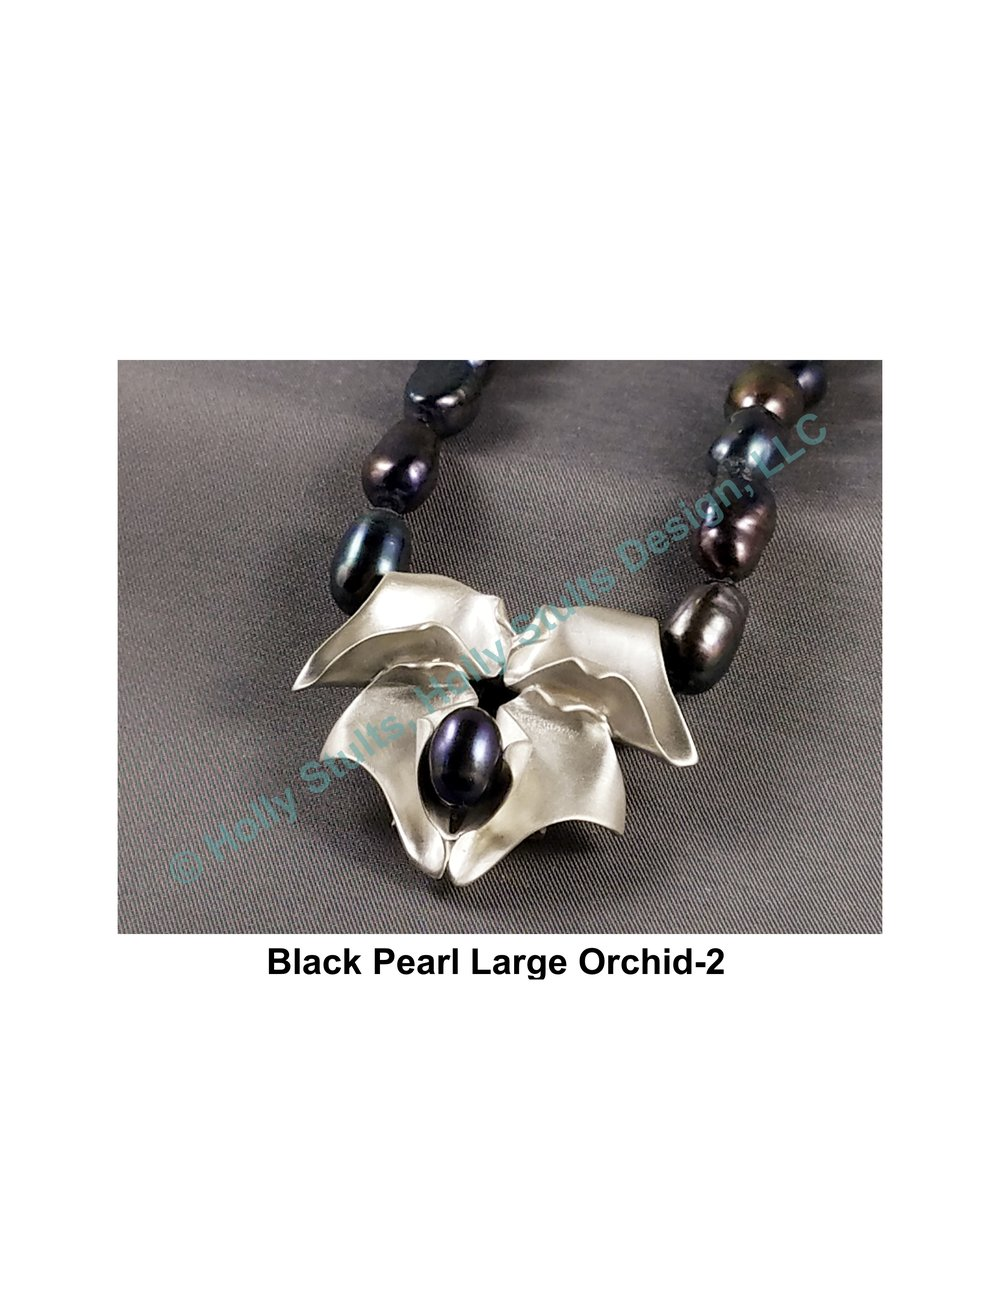 Black Pearl Large Orchid-2.jpg